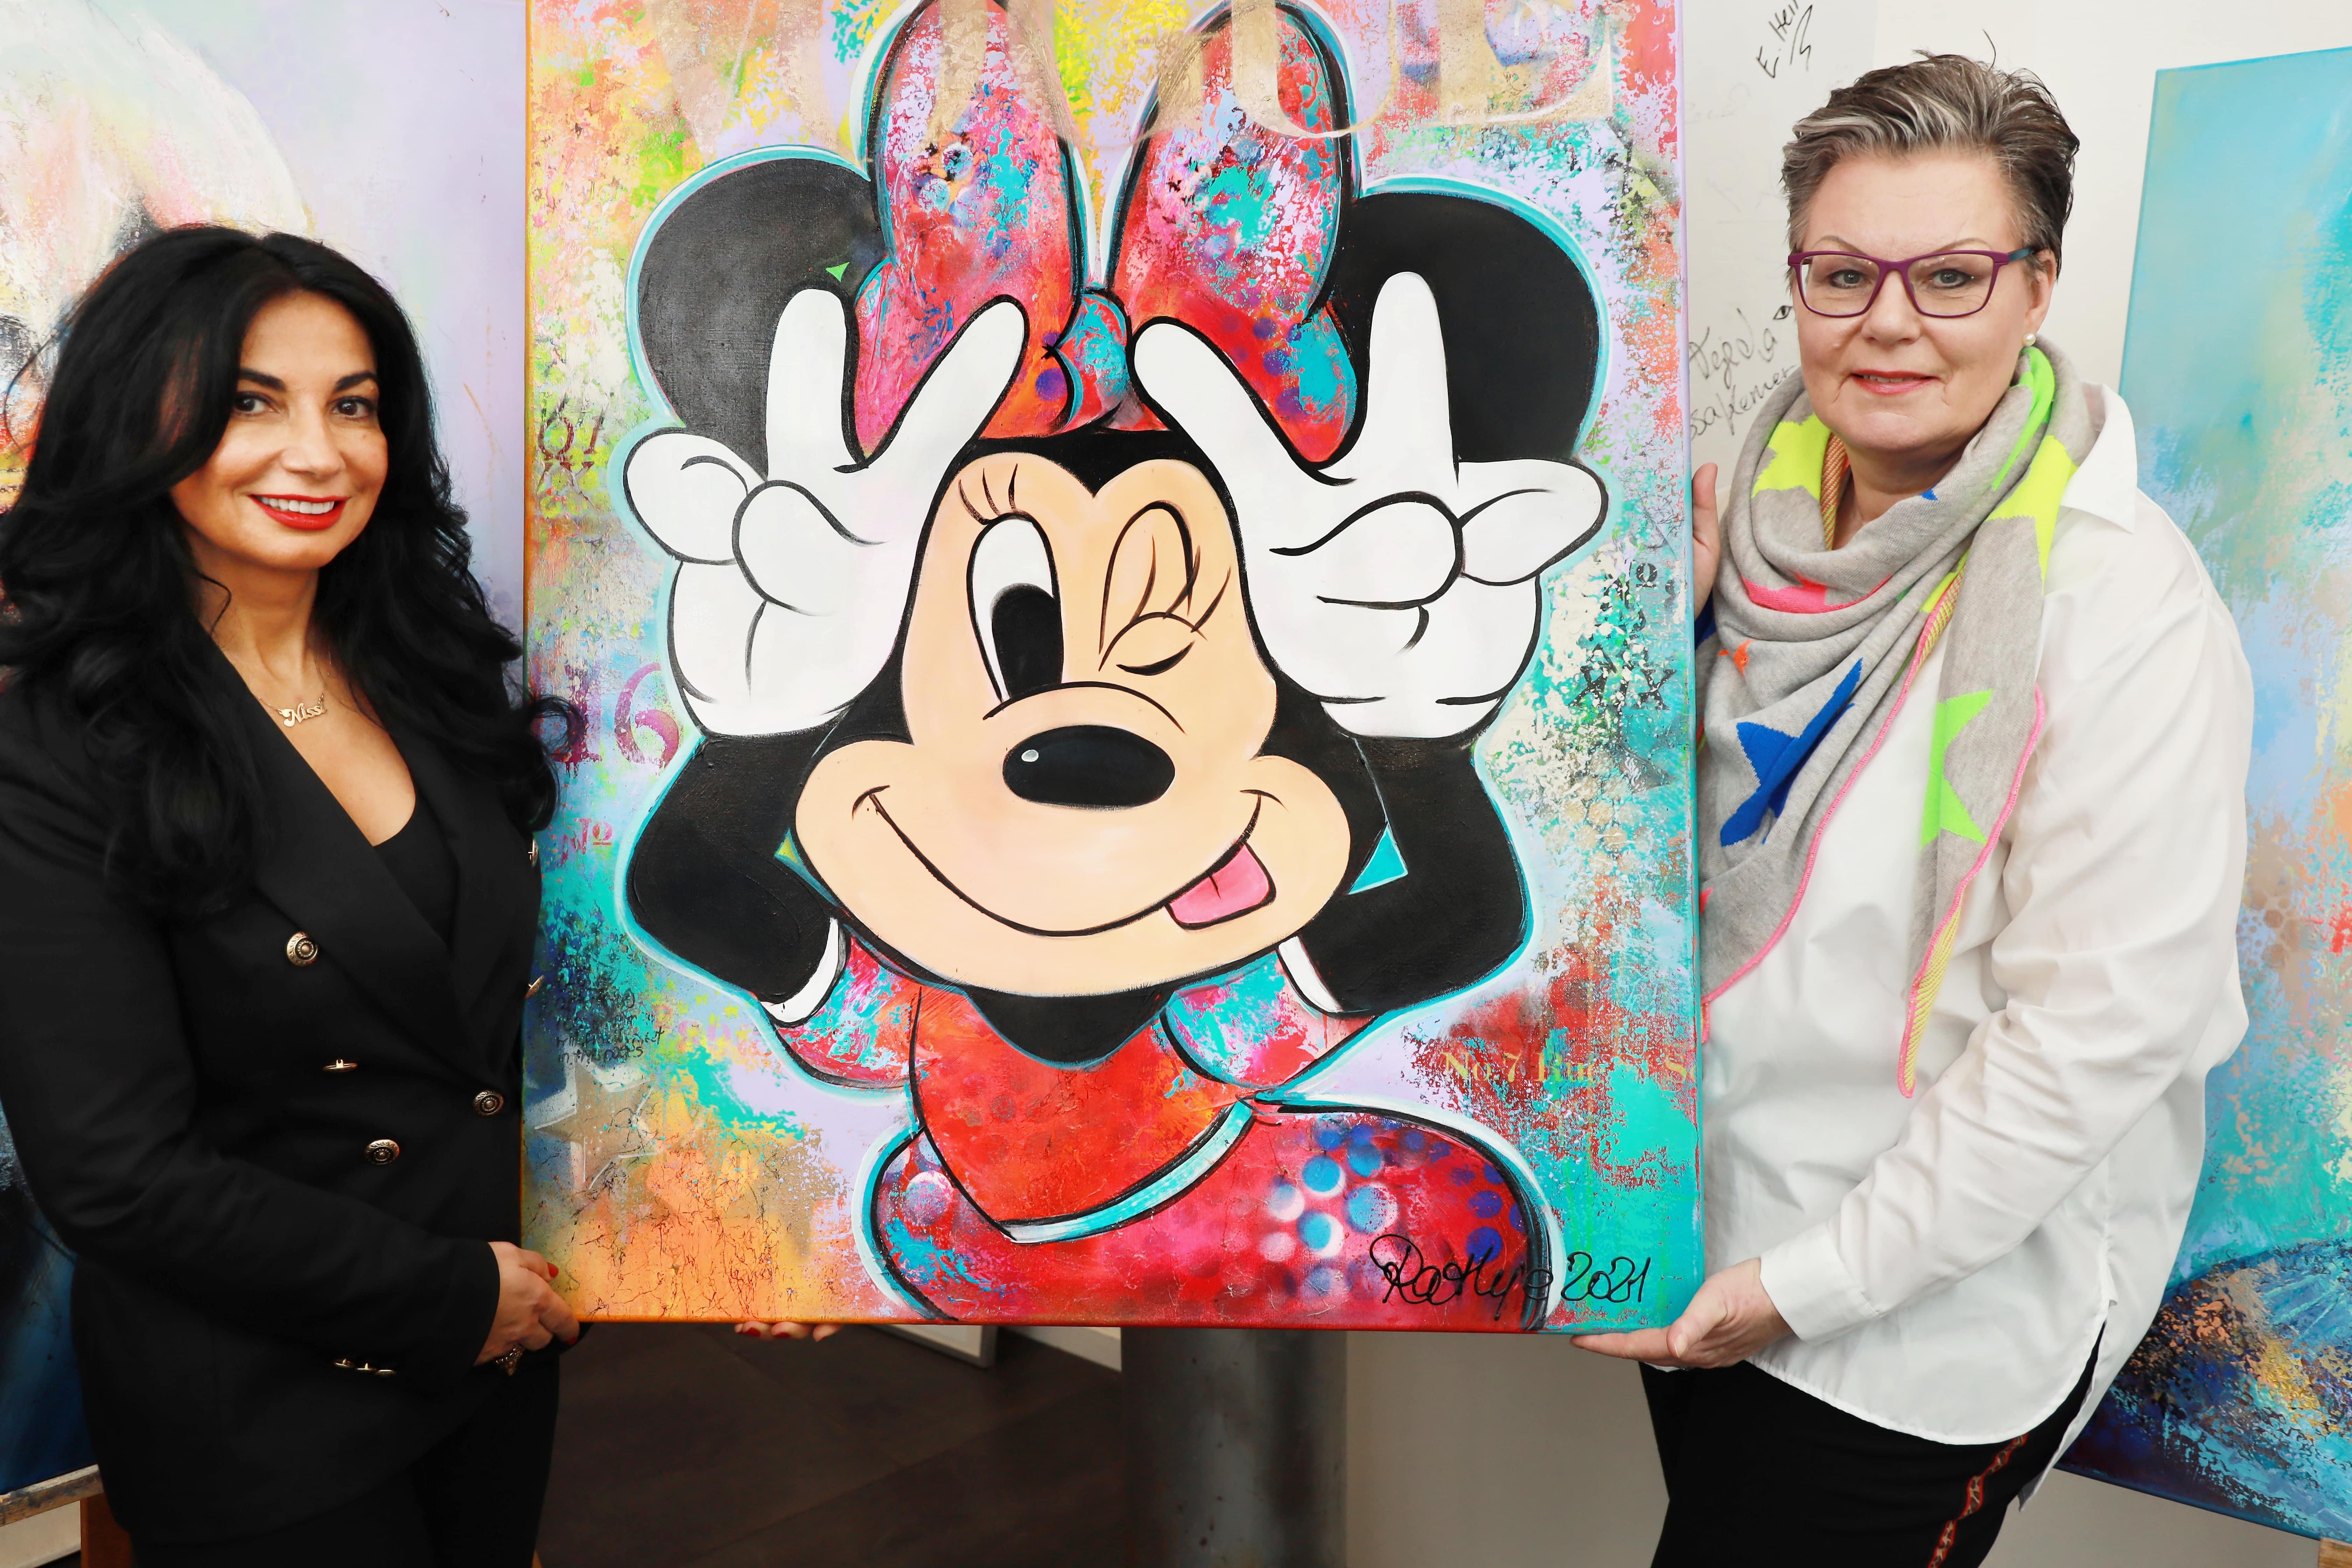 Interview in Hamburg in Nissis Kunstkantine